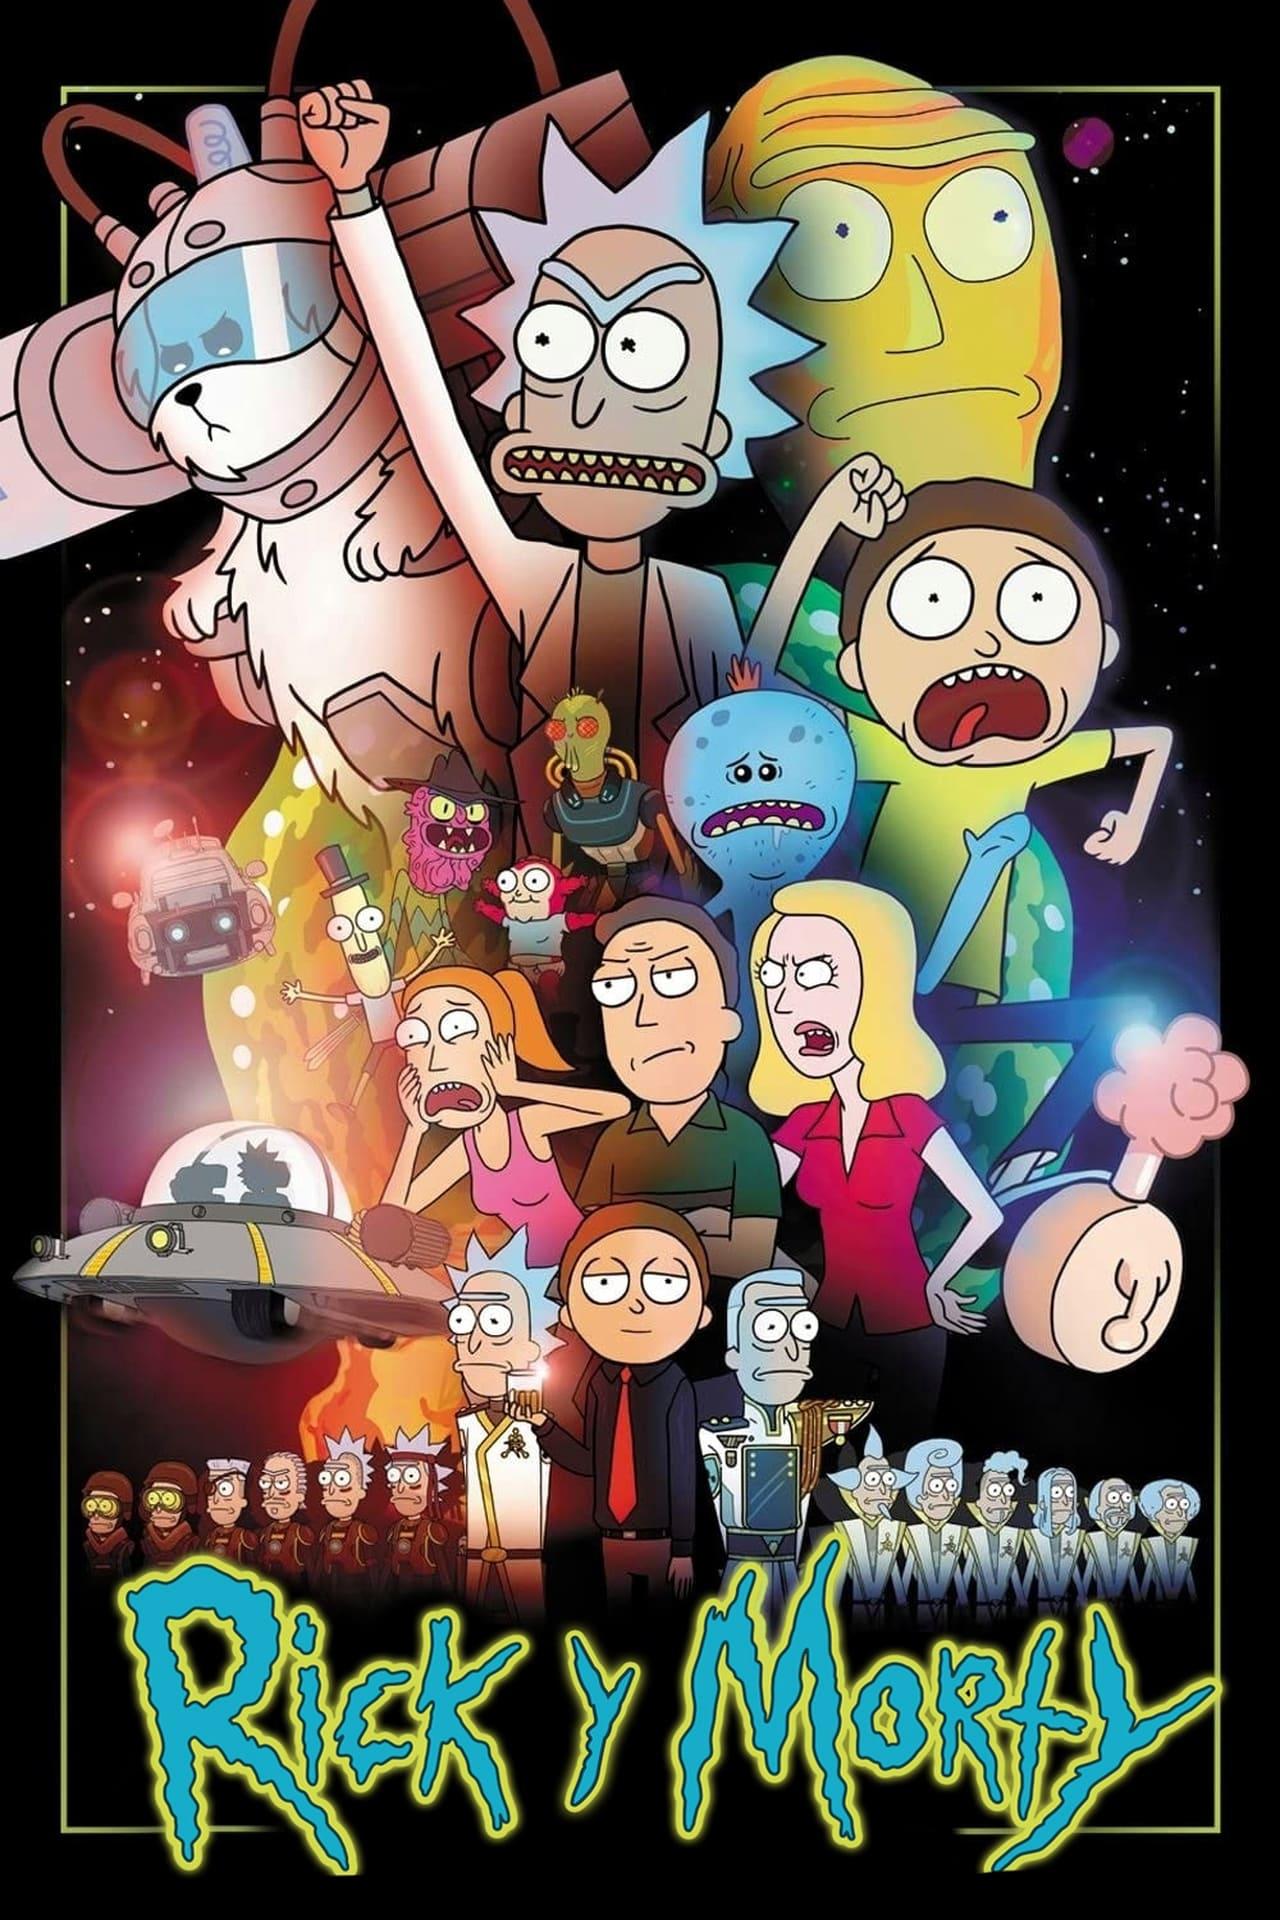 Rick y Morty - Season 3 Episode 1 : Cadena Rickpetua